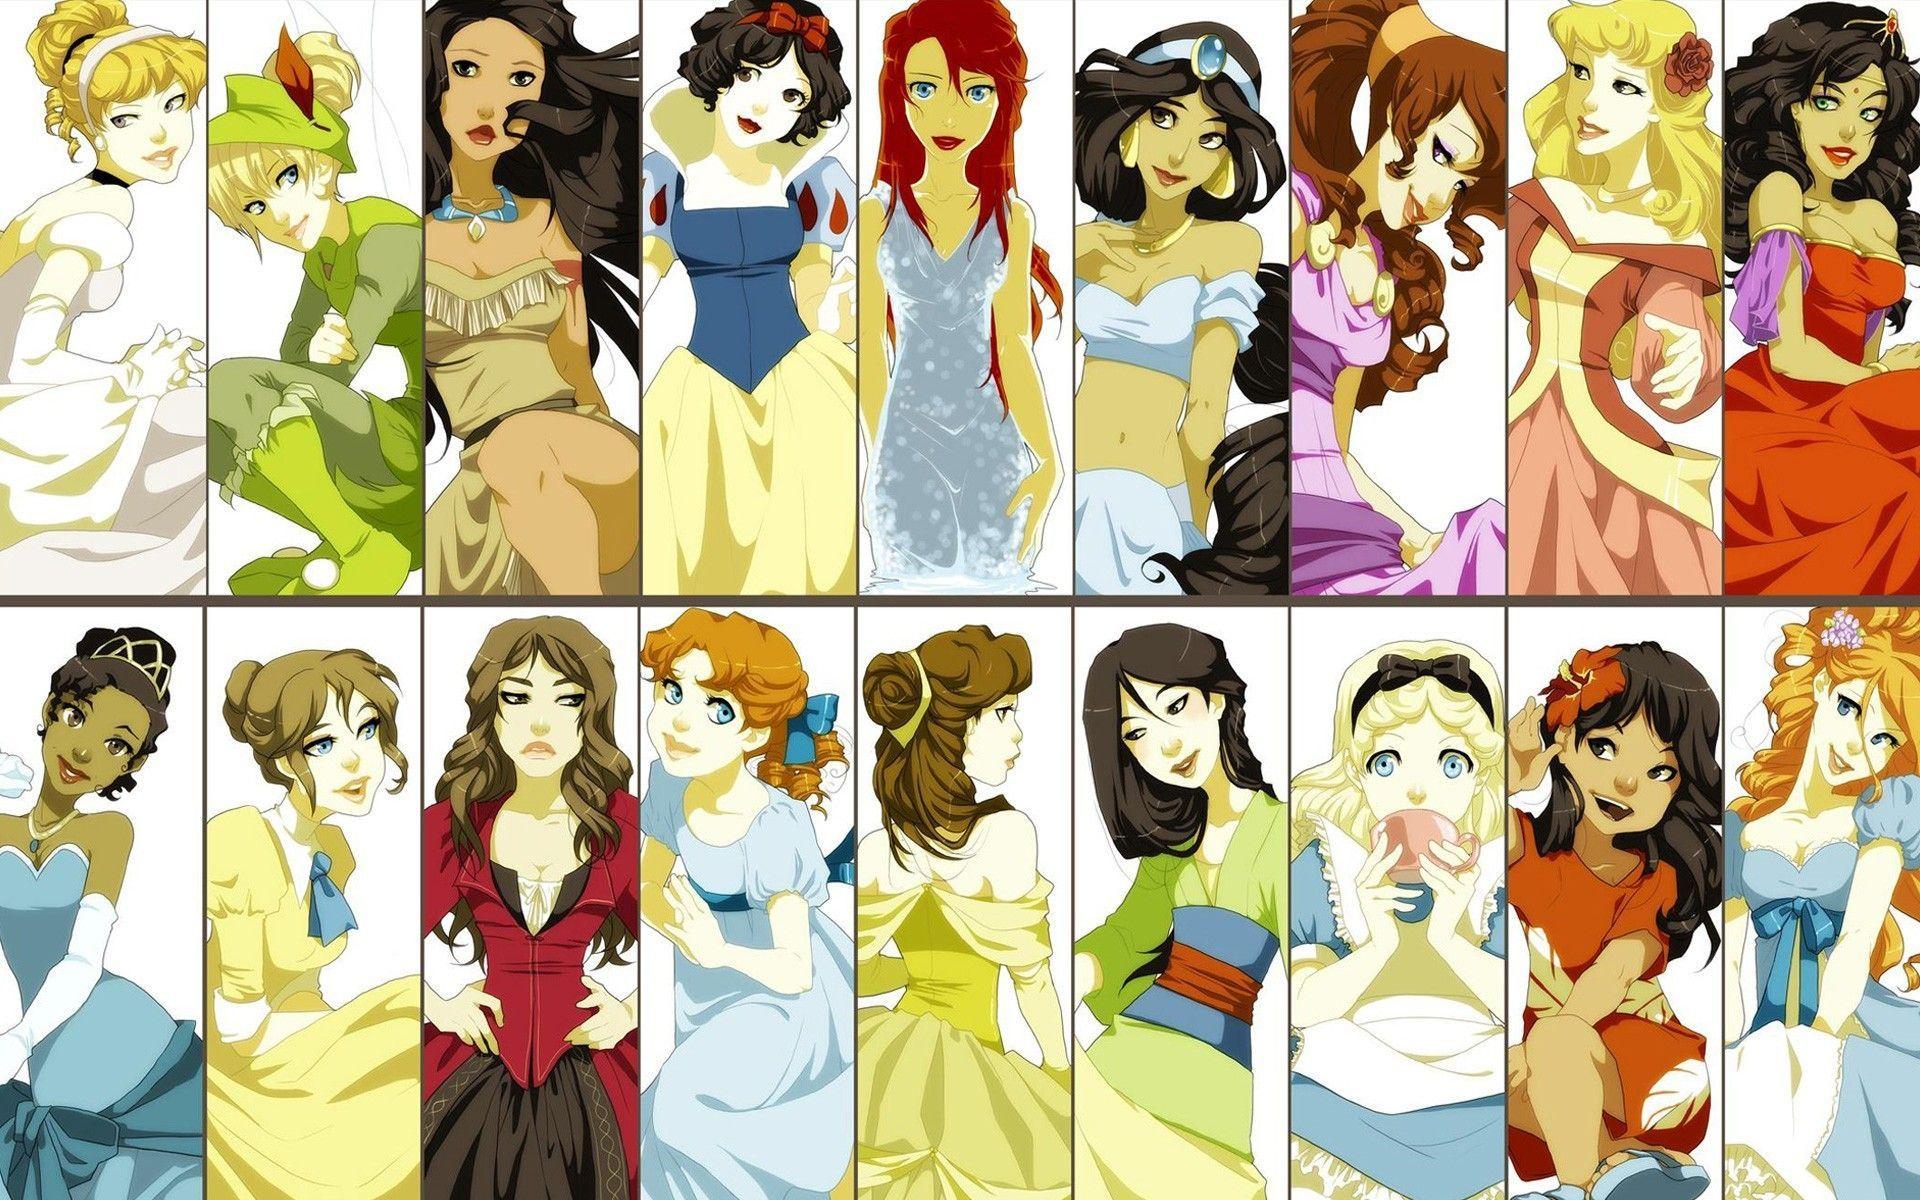 Disney Princess Belle Anime Wallpapers - Wallpaper Cave